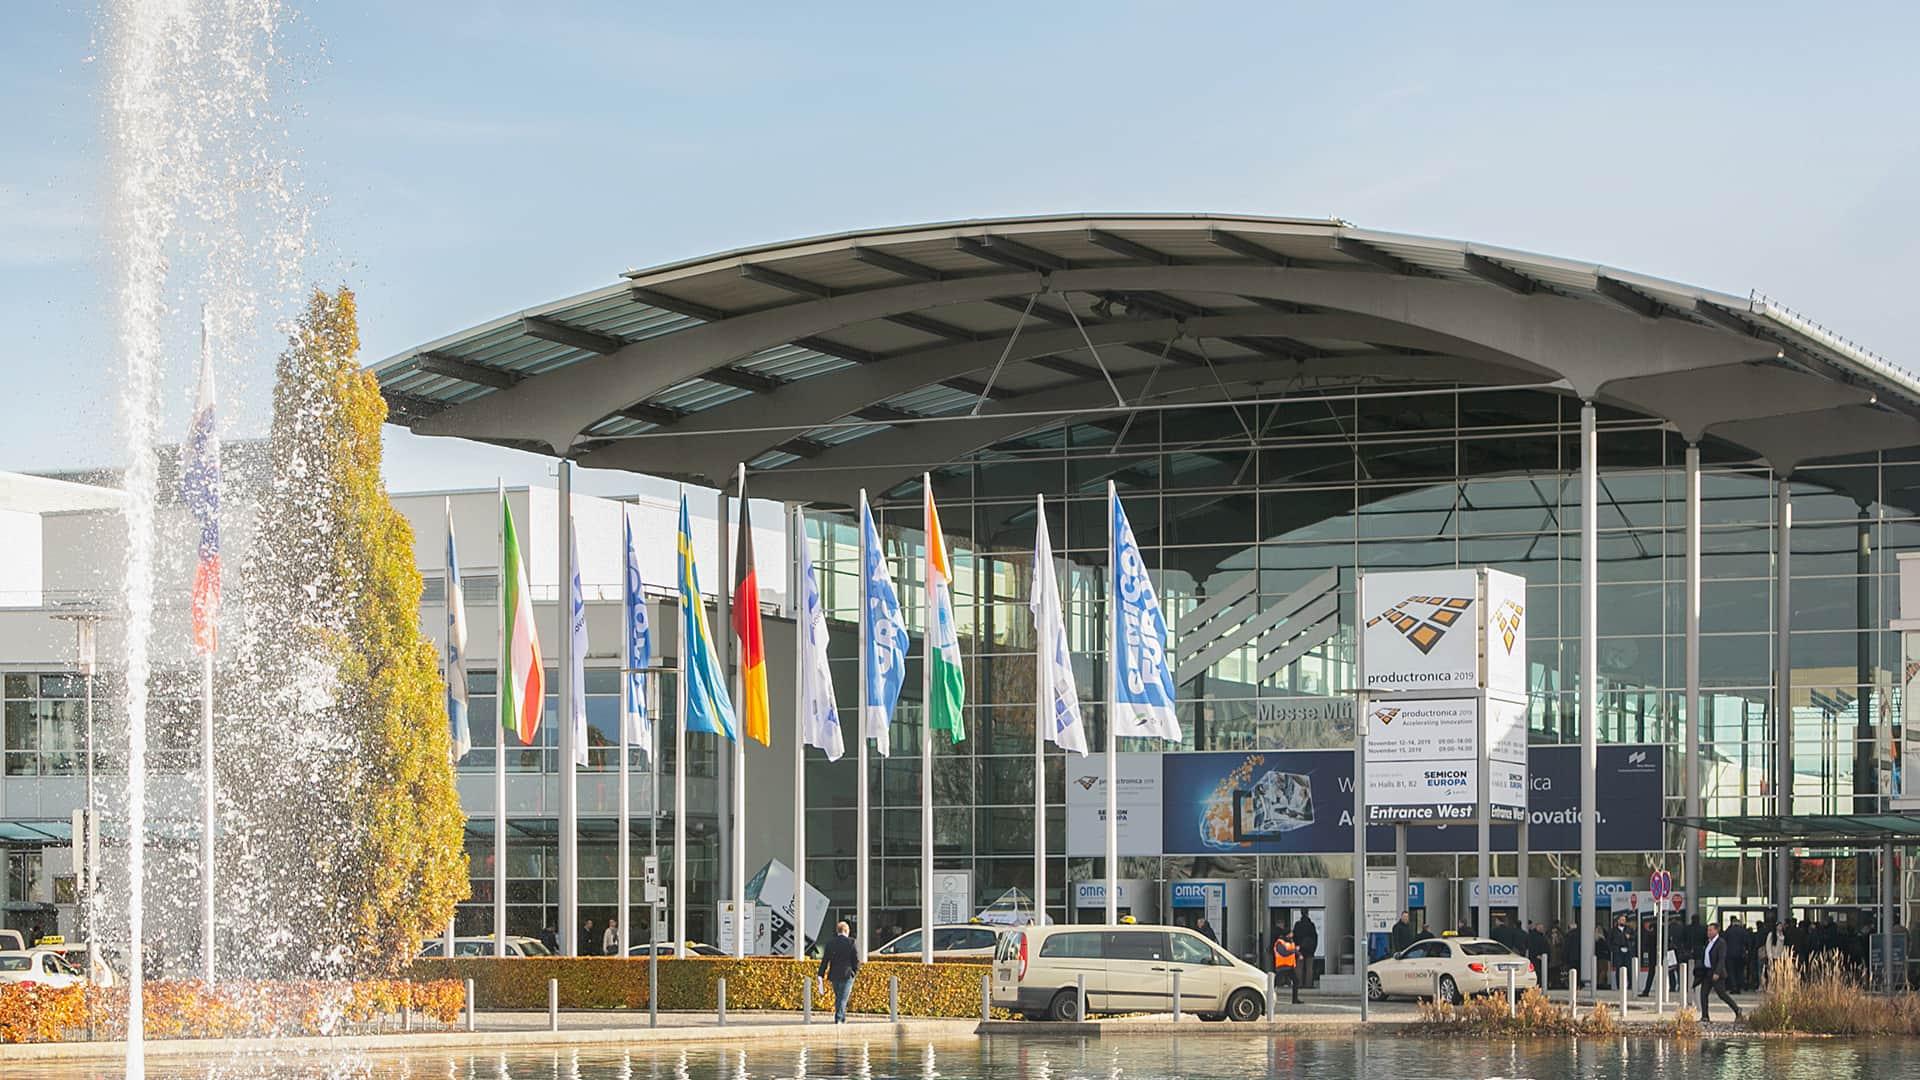 Productronica Fair in Munich